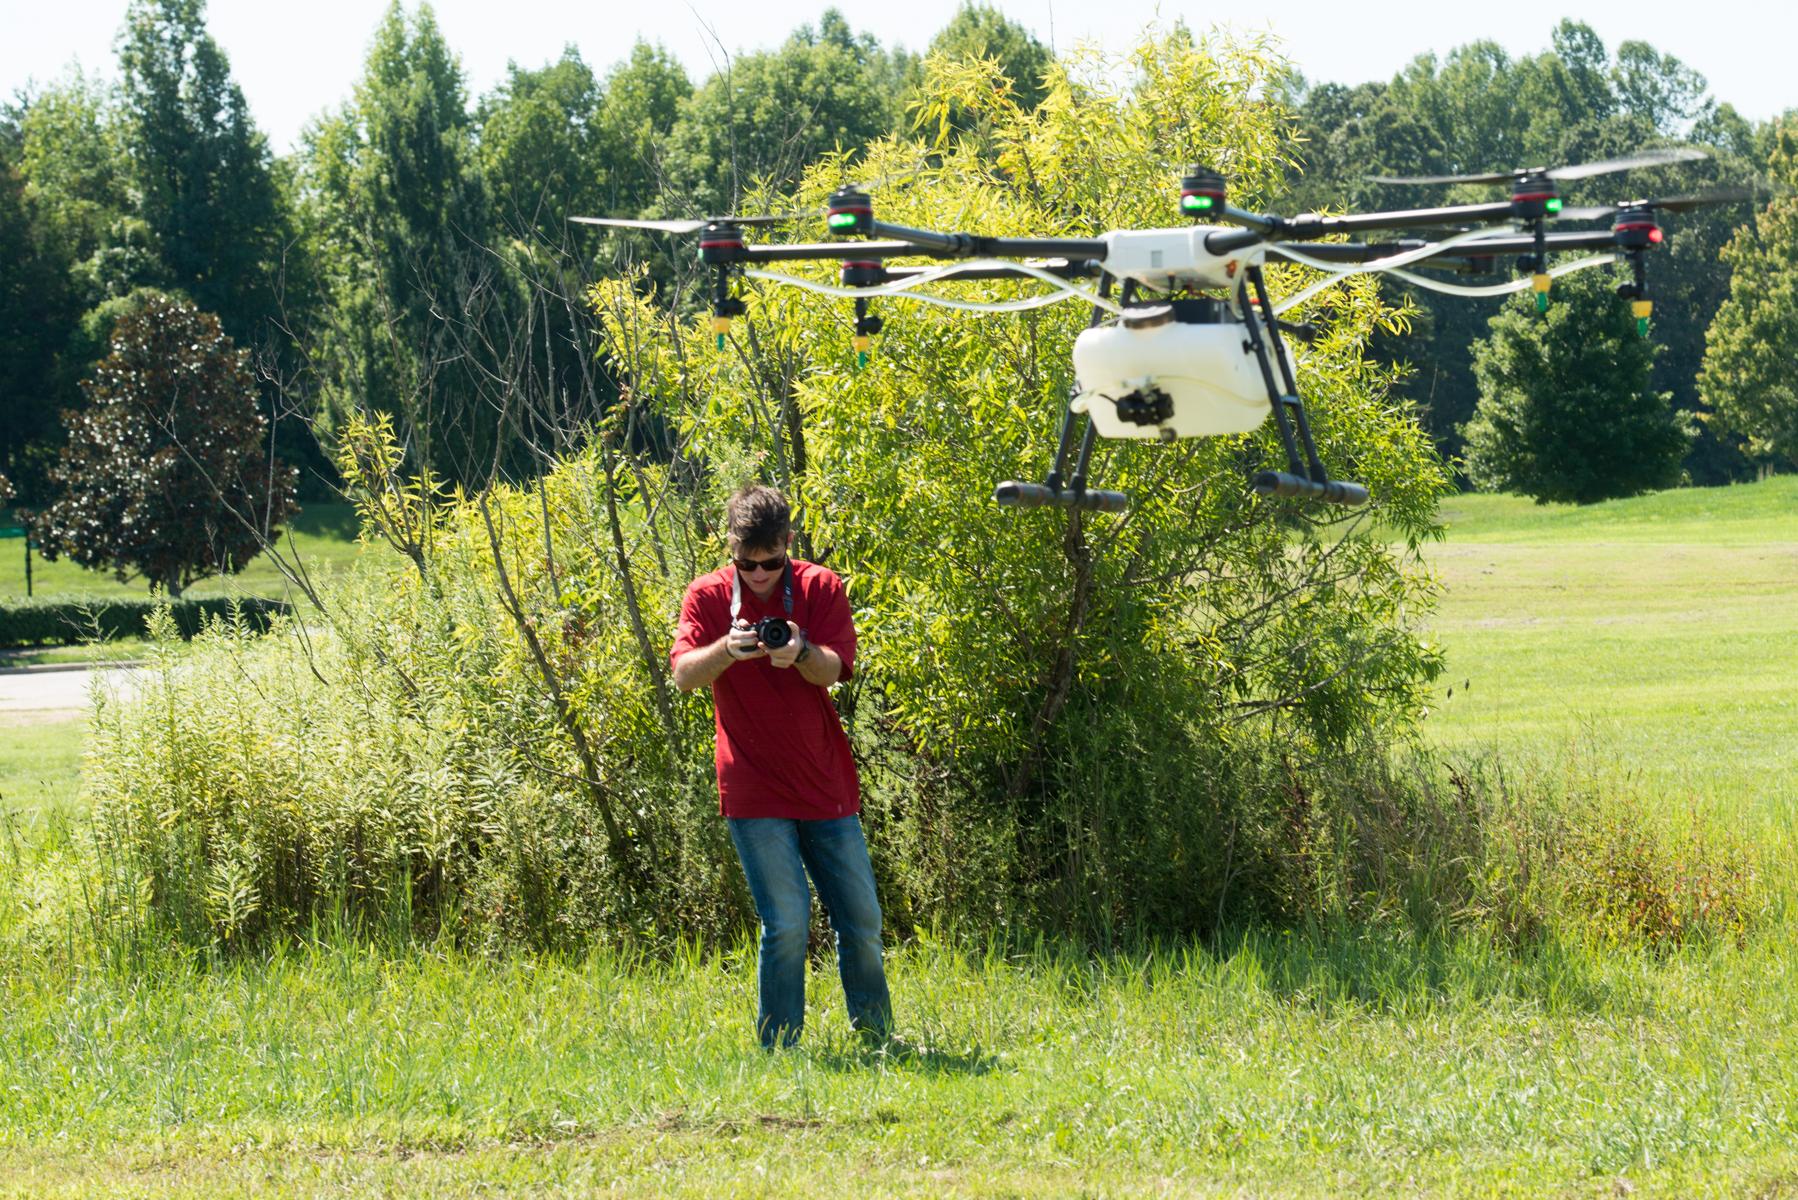 avia-20180807-dronesummit_-377-of-670_43047050435_o.jpg